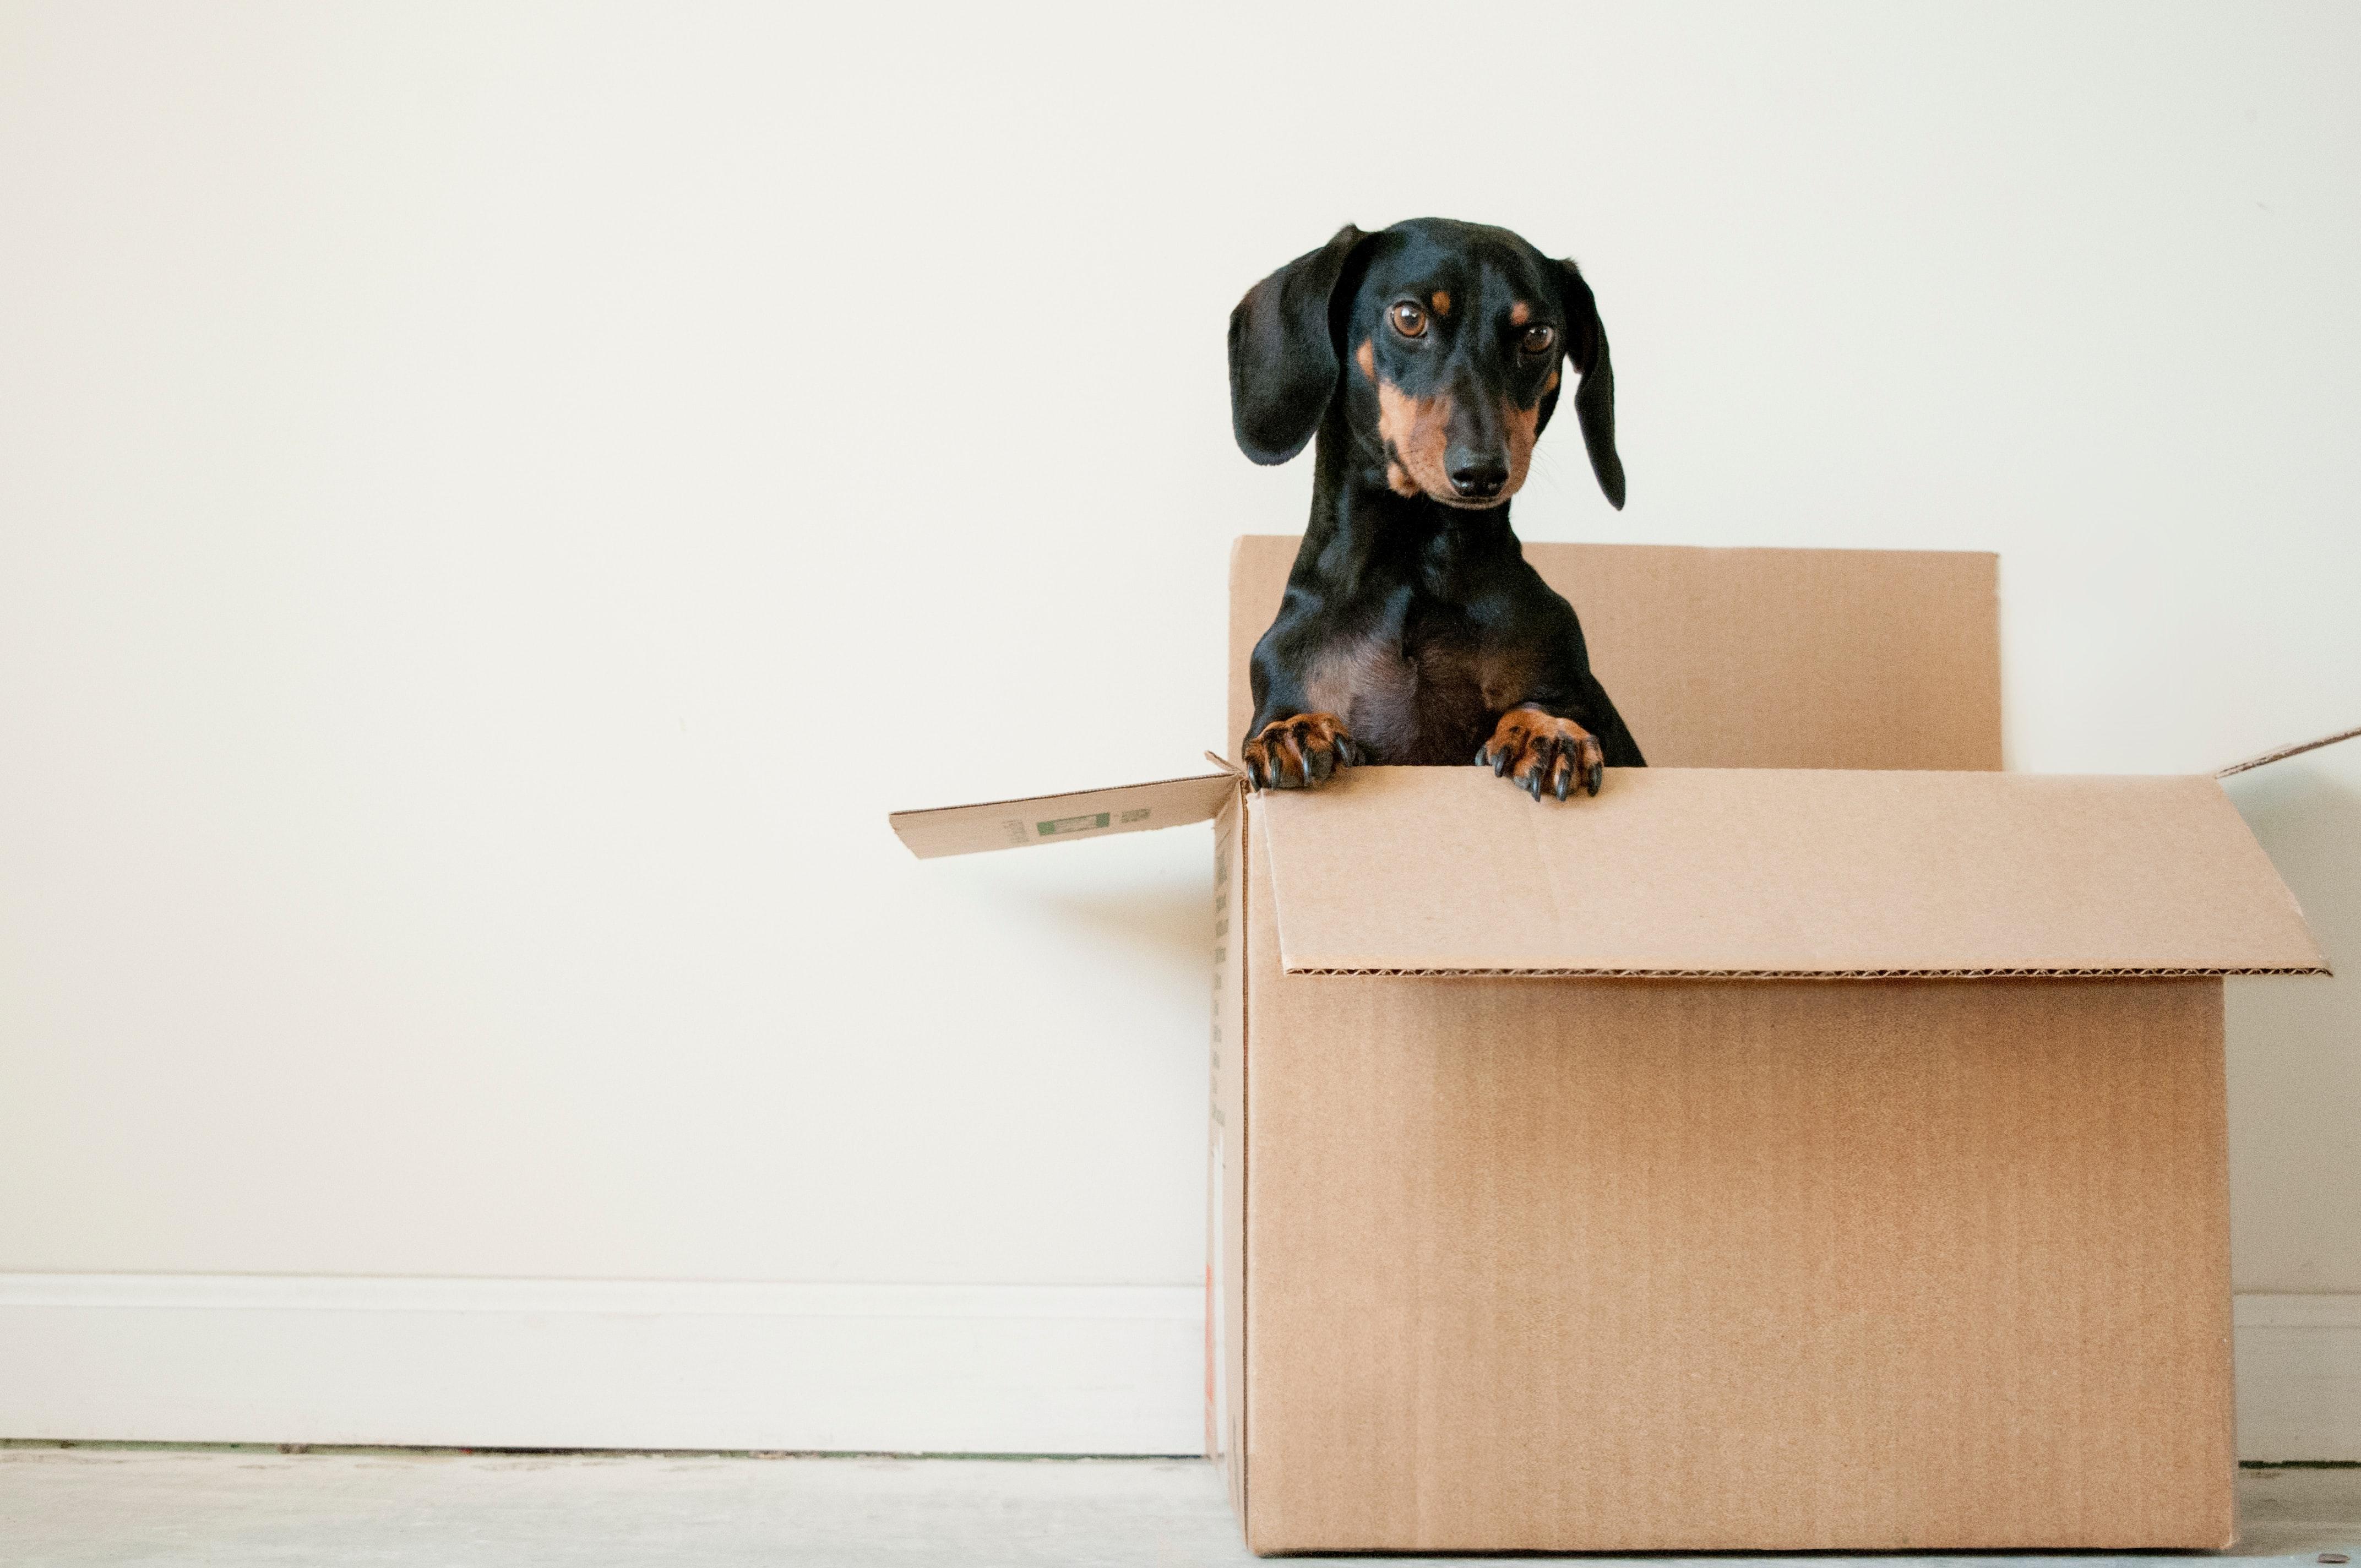 Box Improves 365 Integration